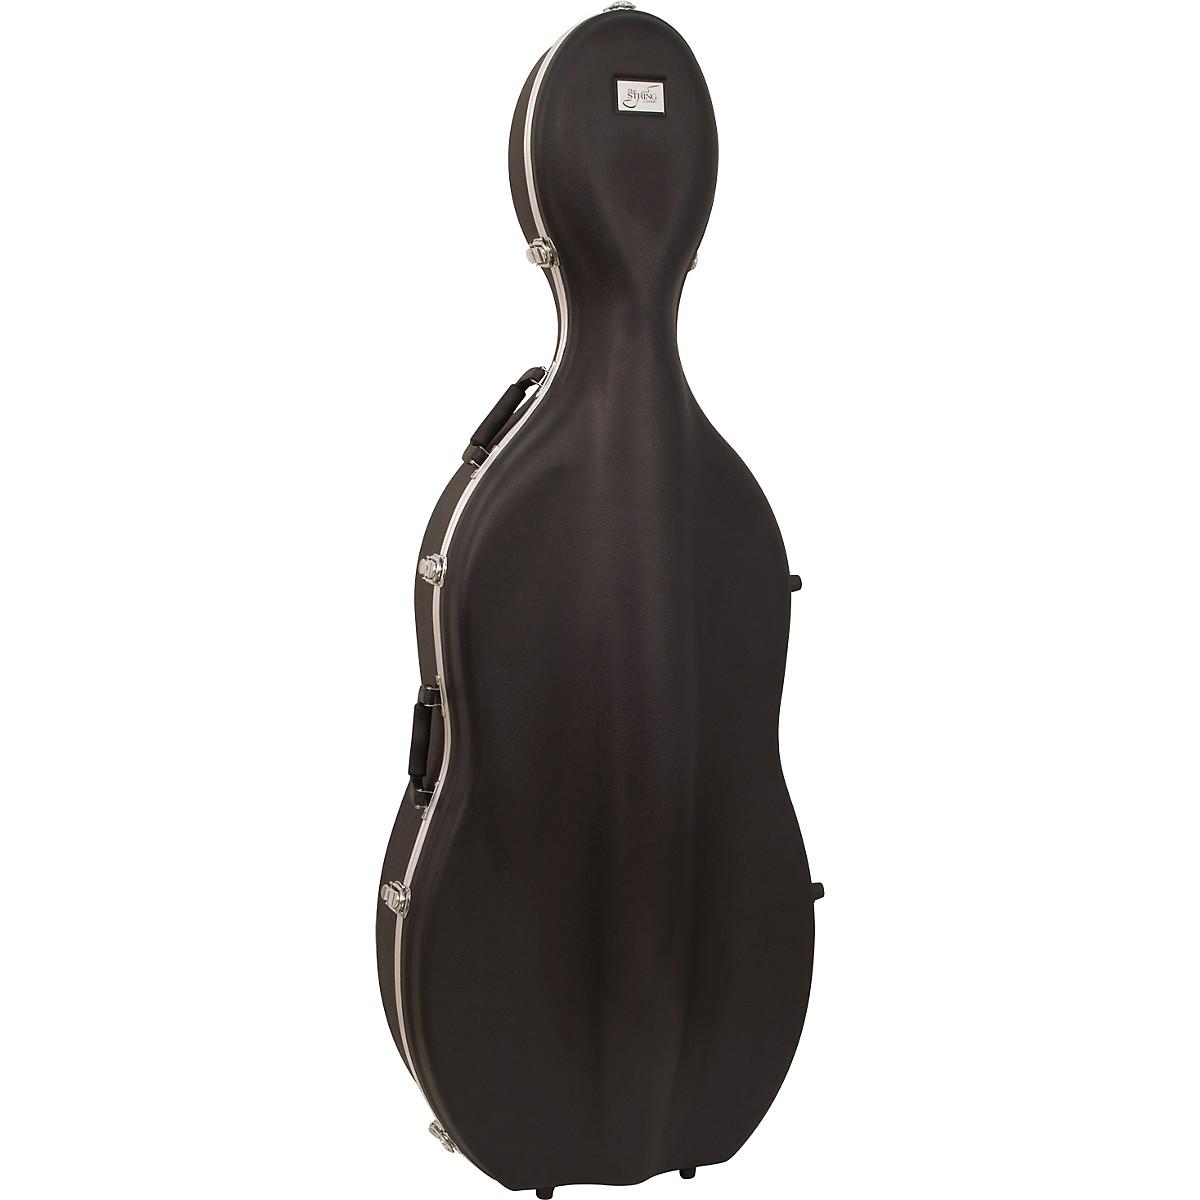 Bellafina ABS Cello Case with Wheels